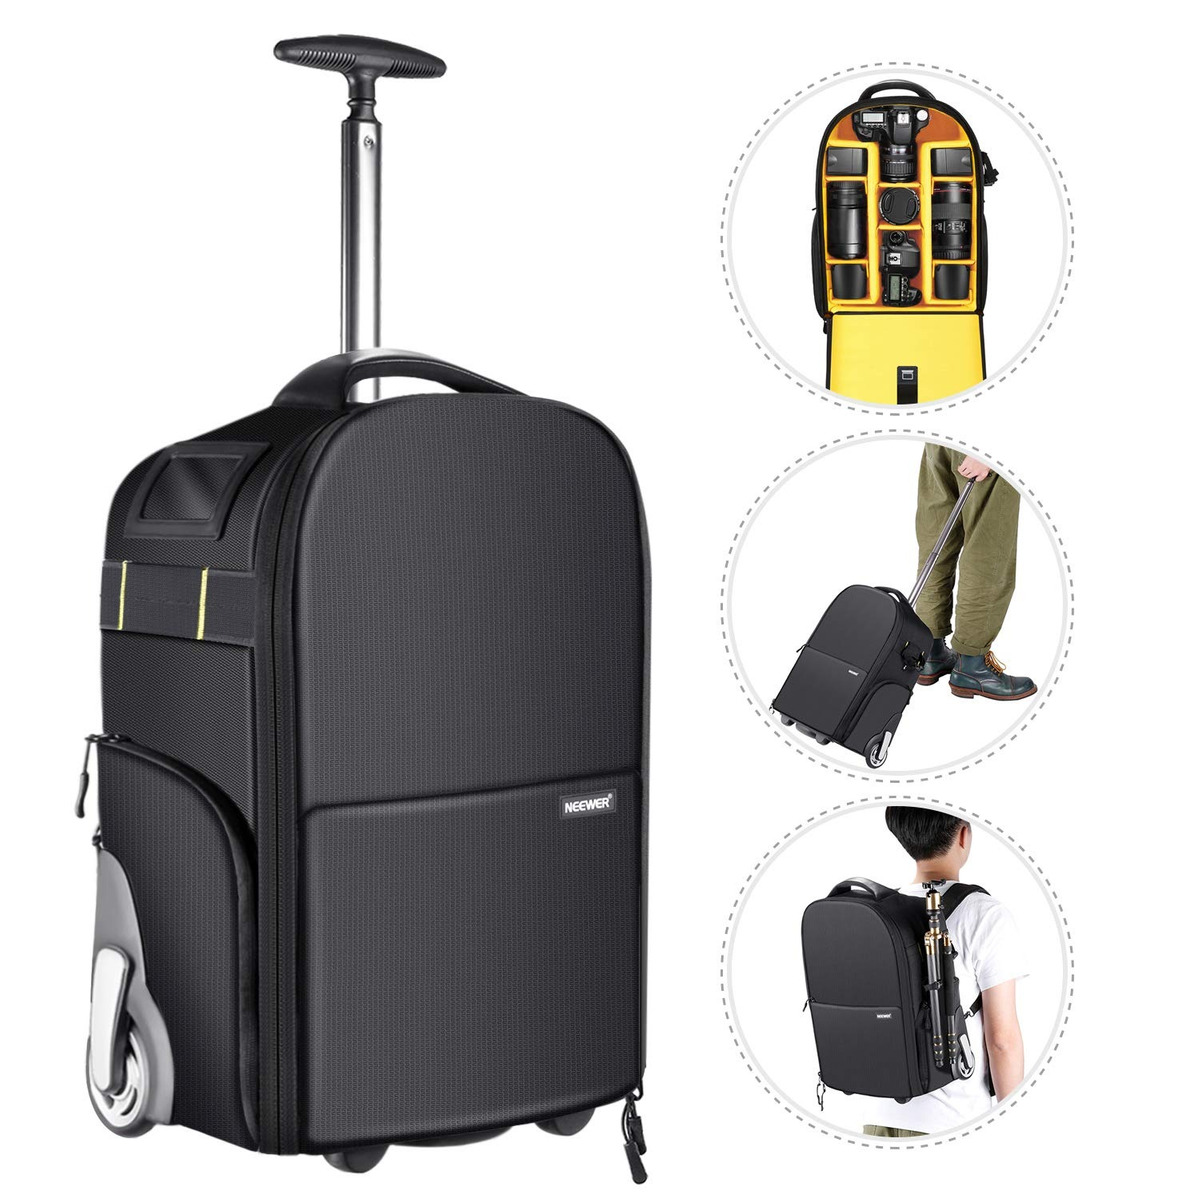 53024fcec neewer 2-en-1 ruedas cámara mochila carretilla maleta, anti. Cargando zoom.